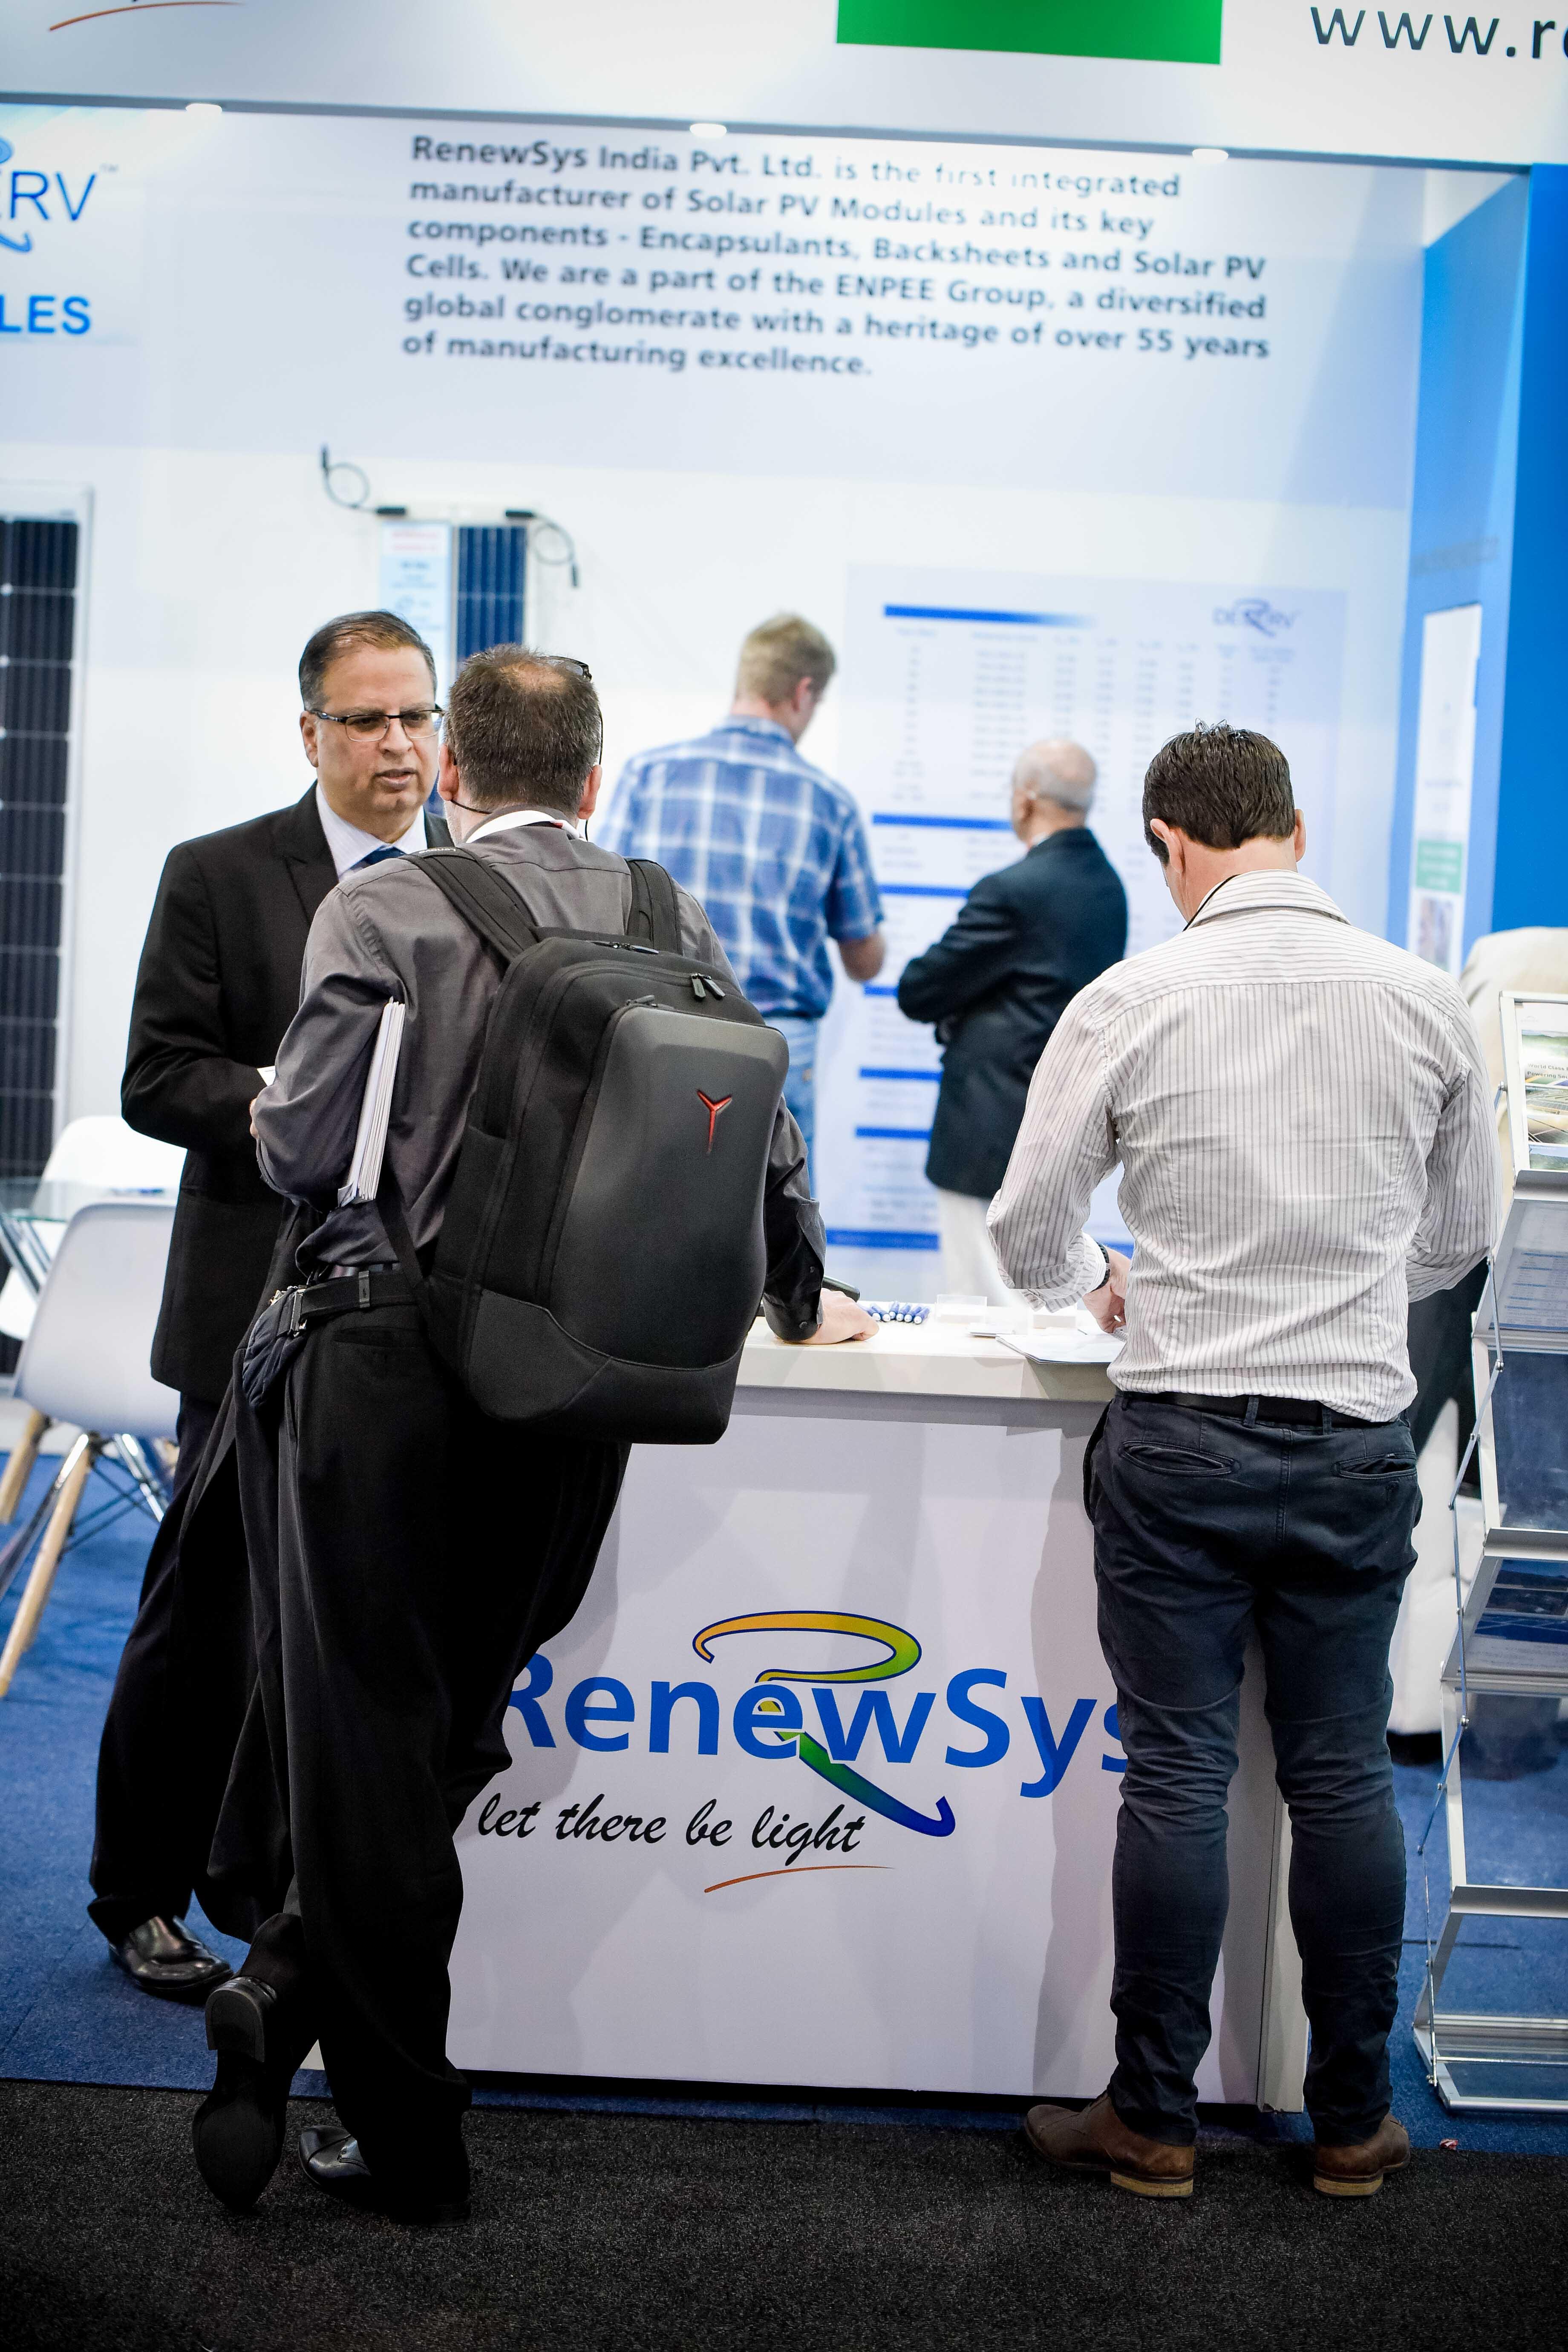 Solar Show Africa 2019-RenewSys India Pv